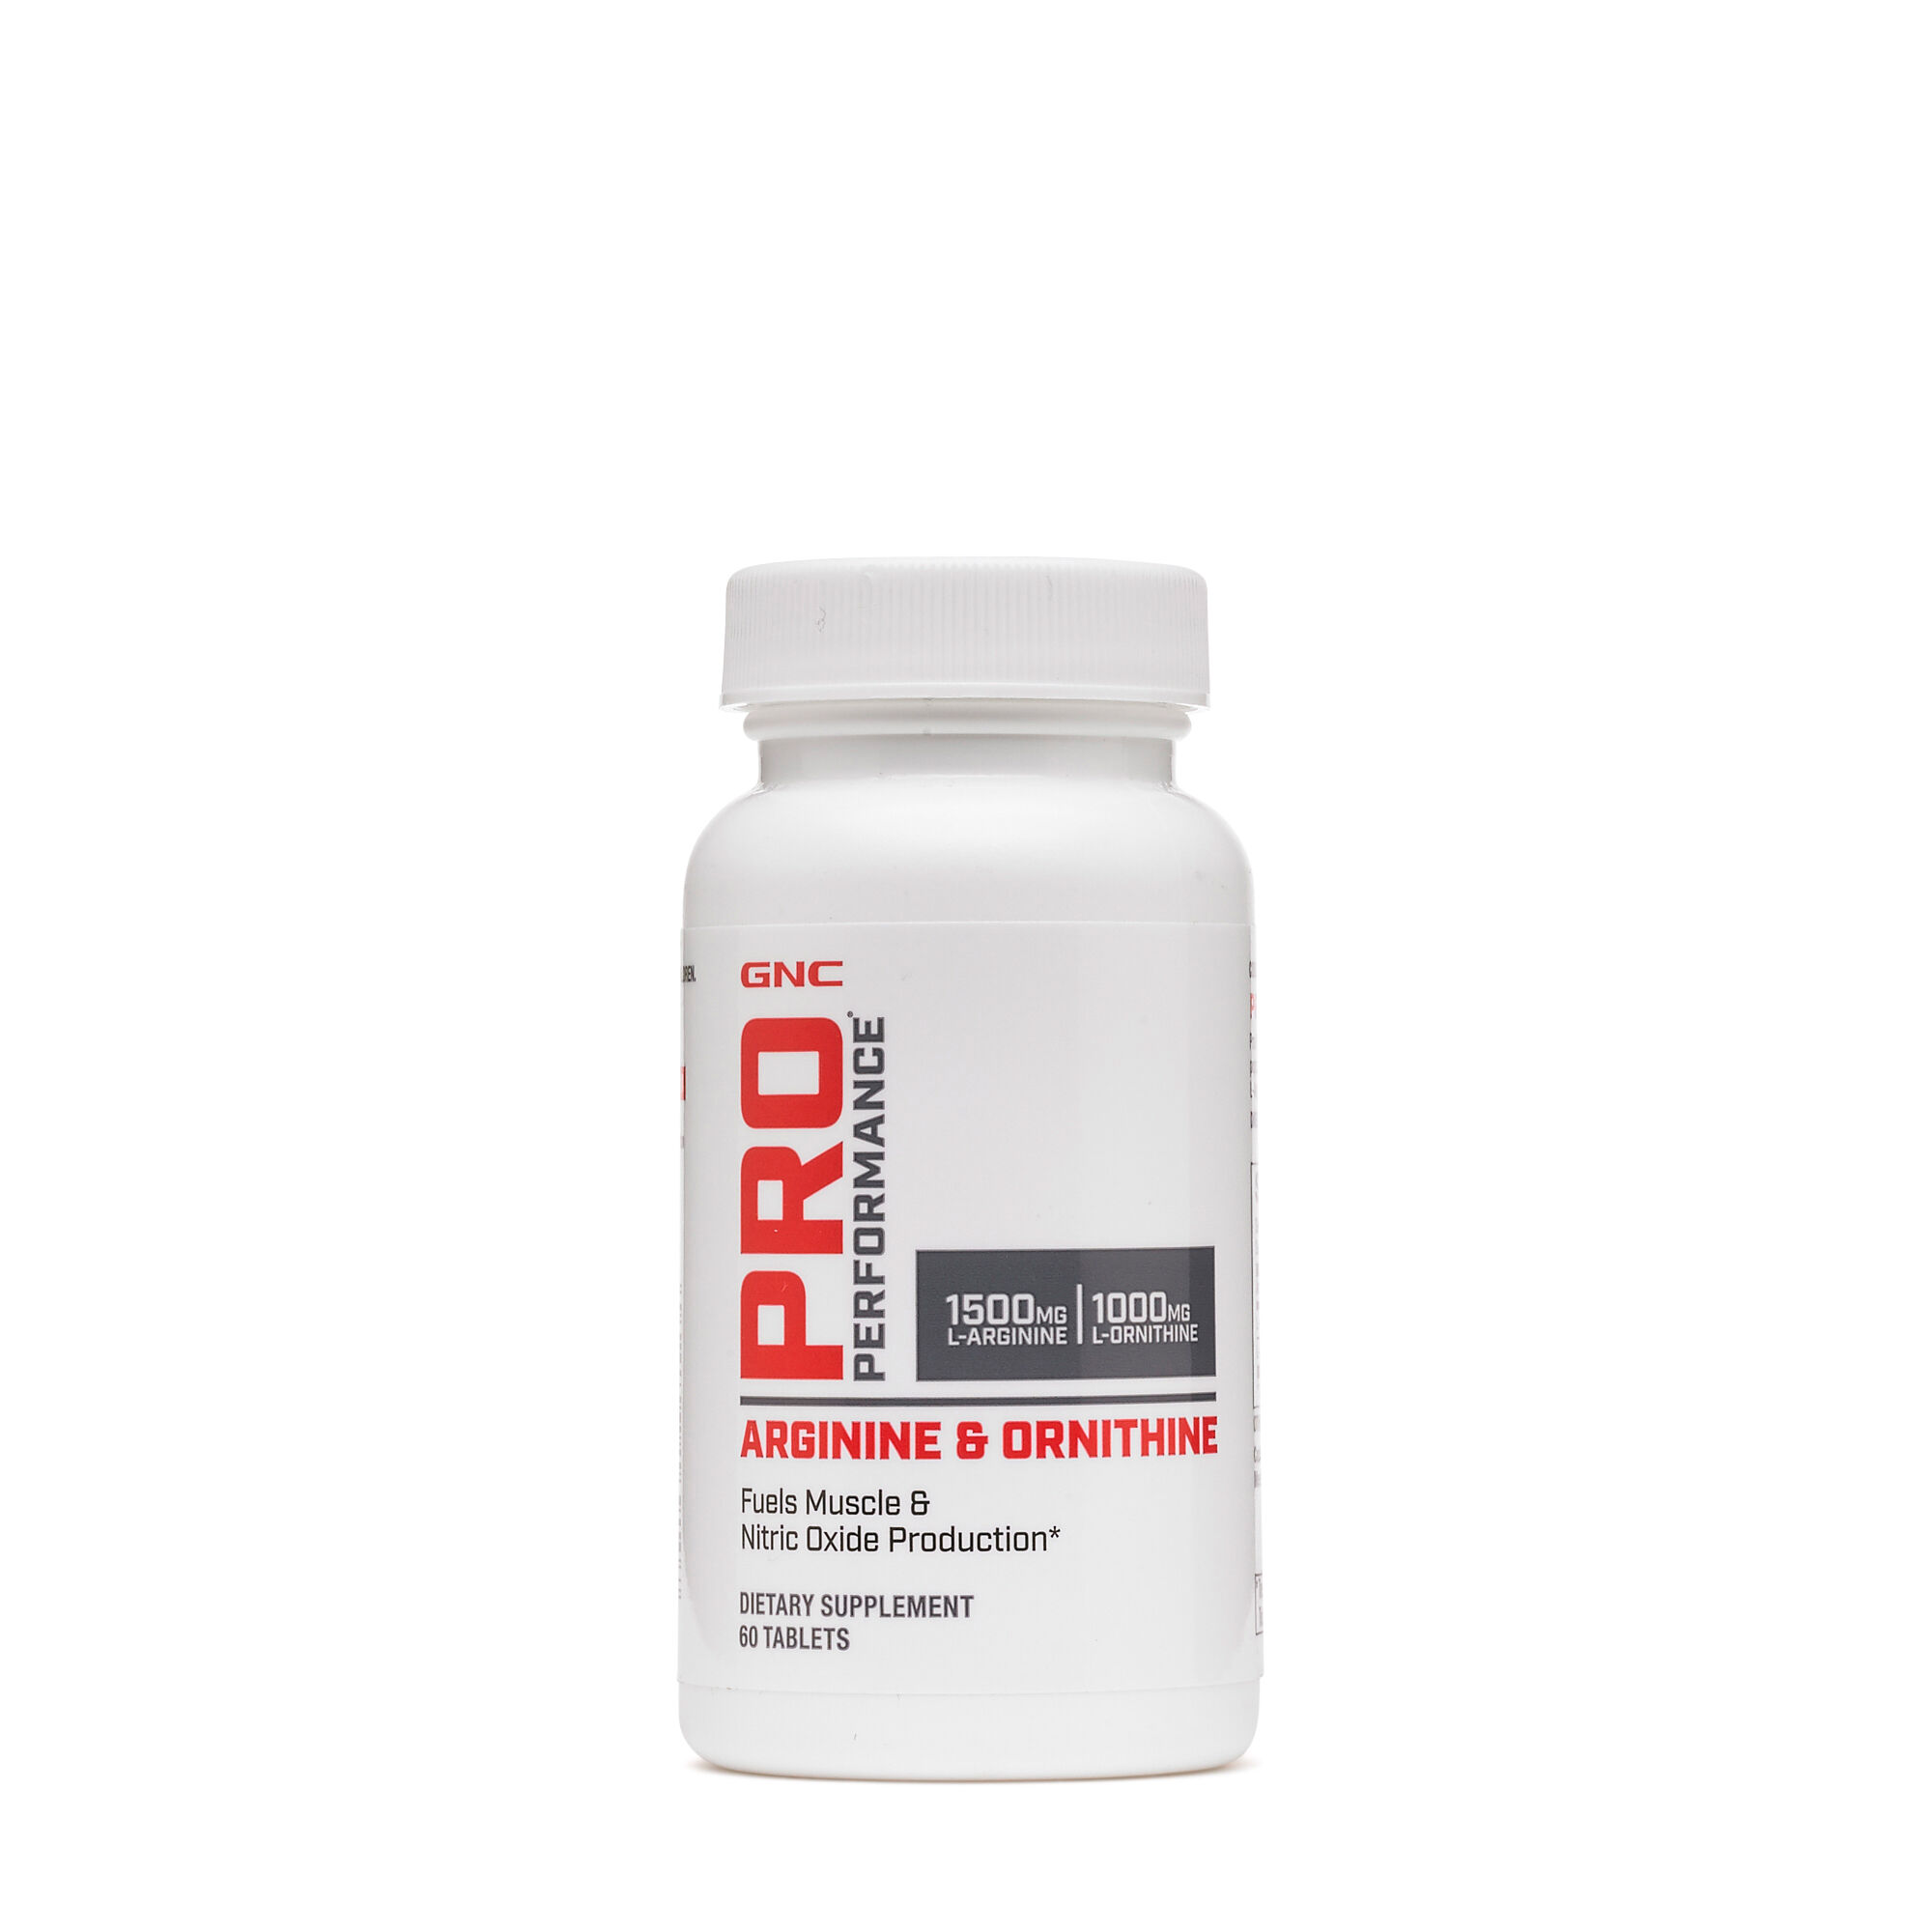 GNC Pro Performance® Arginine and Ornithine